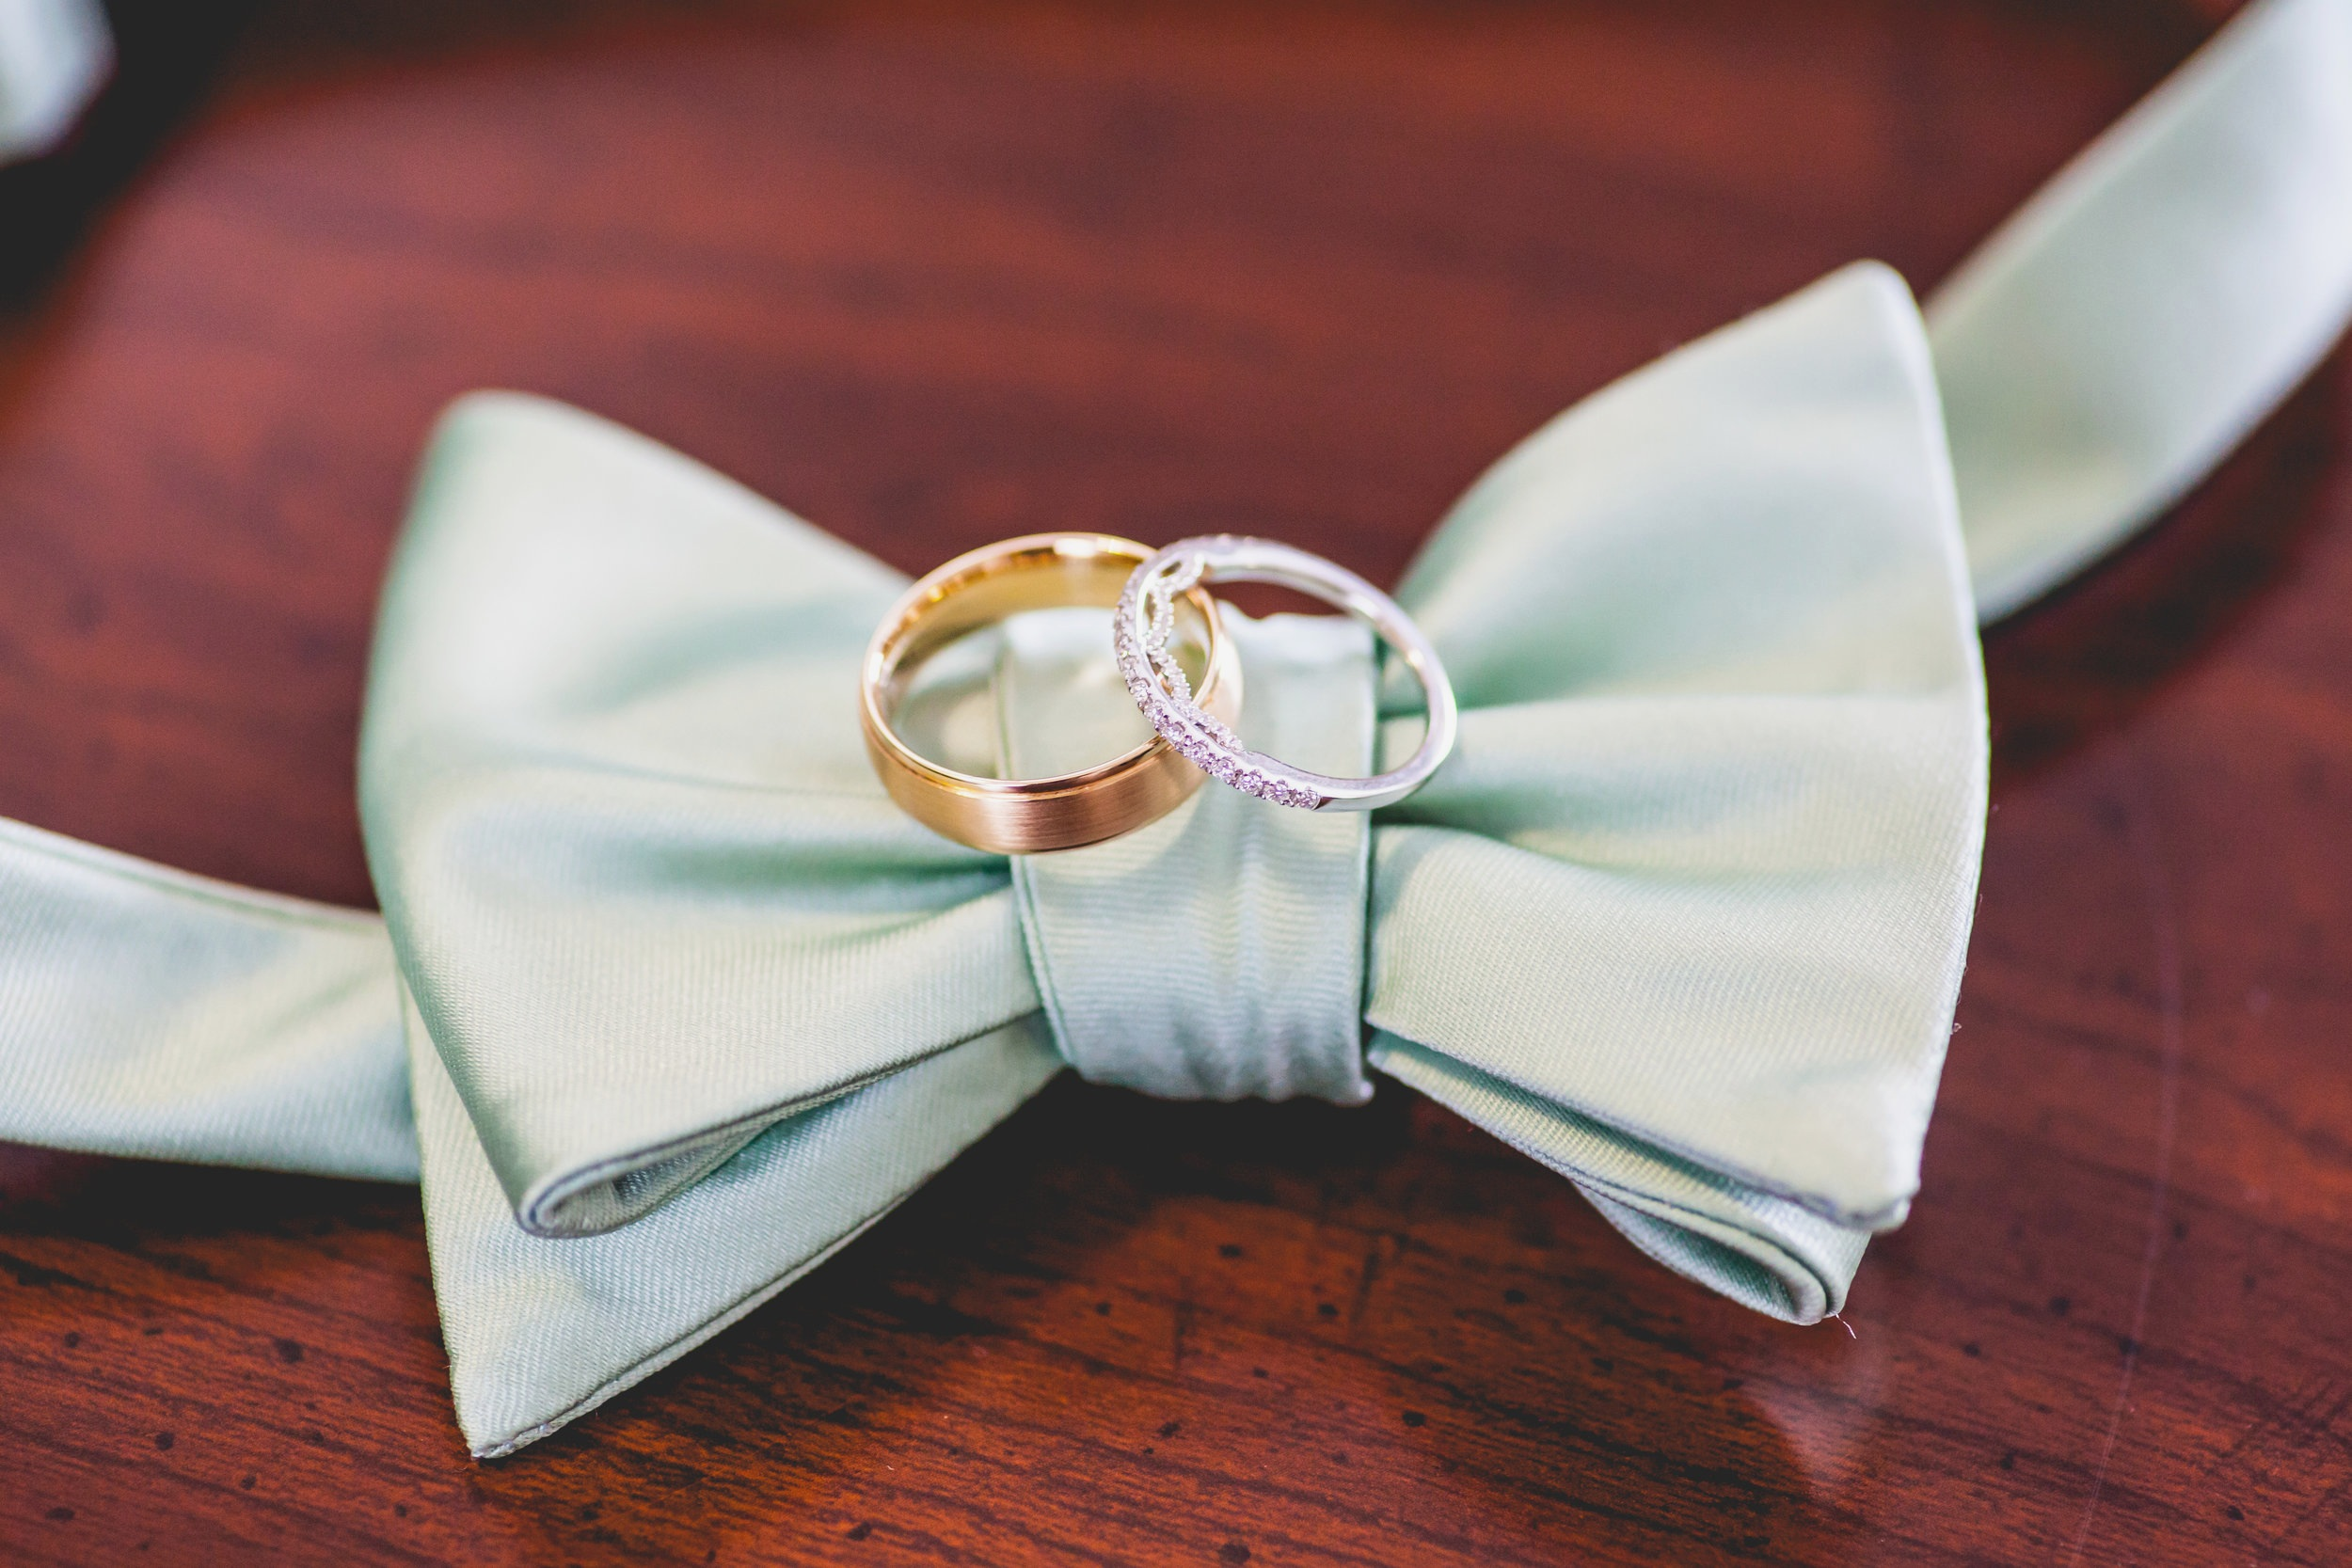 boone-hall-plantation-charleston-wedding-bowtie-wedding-bands-details-kailee-dimeglio-photography--3547.jpg